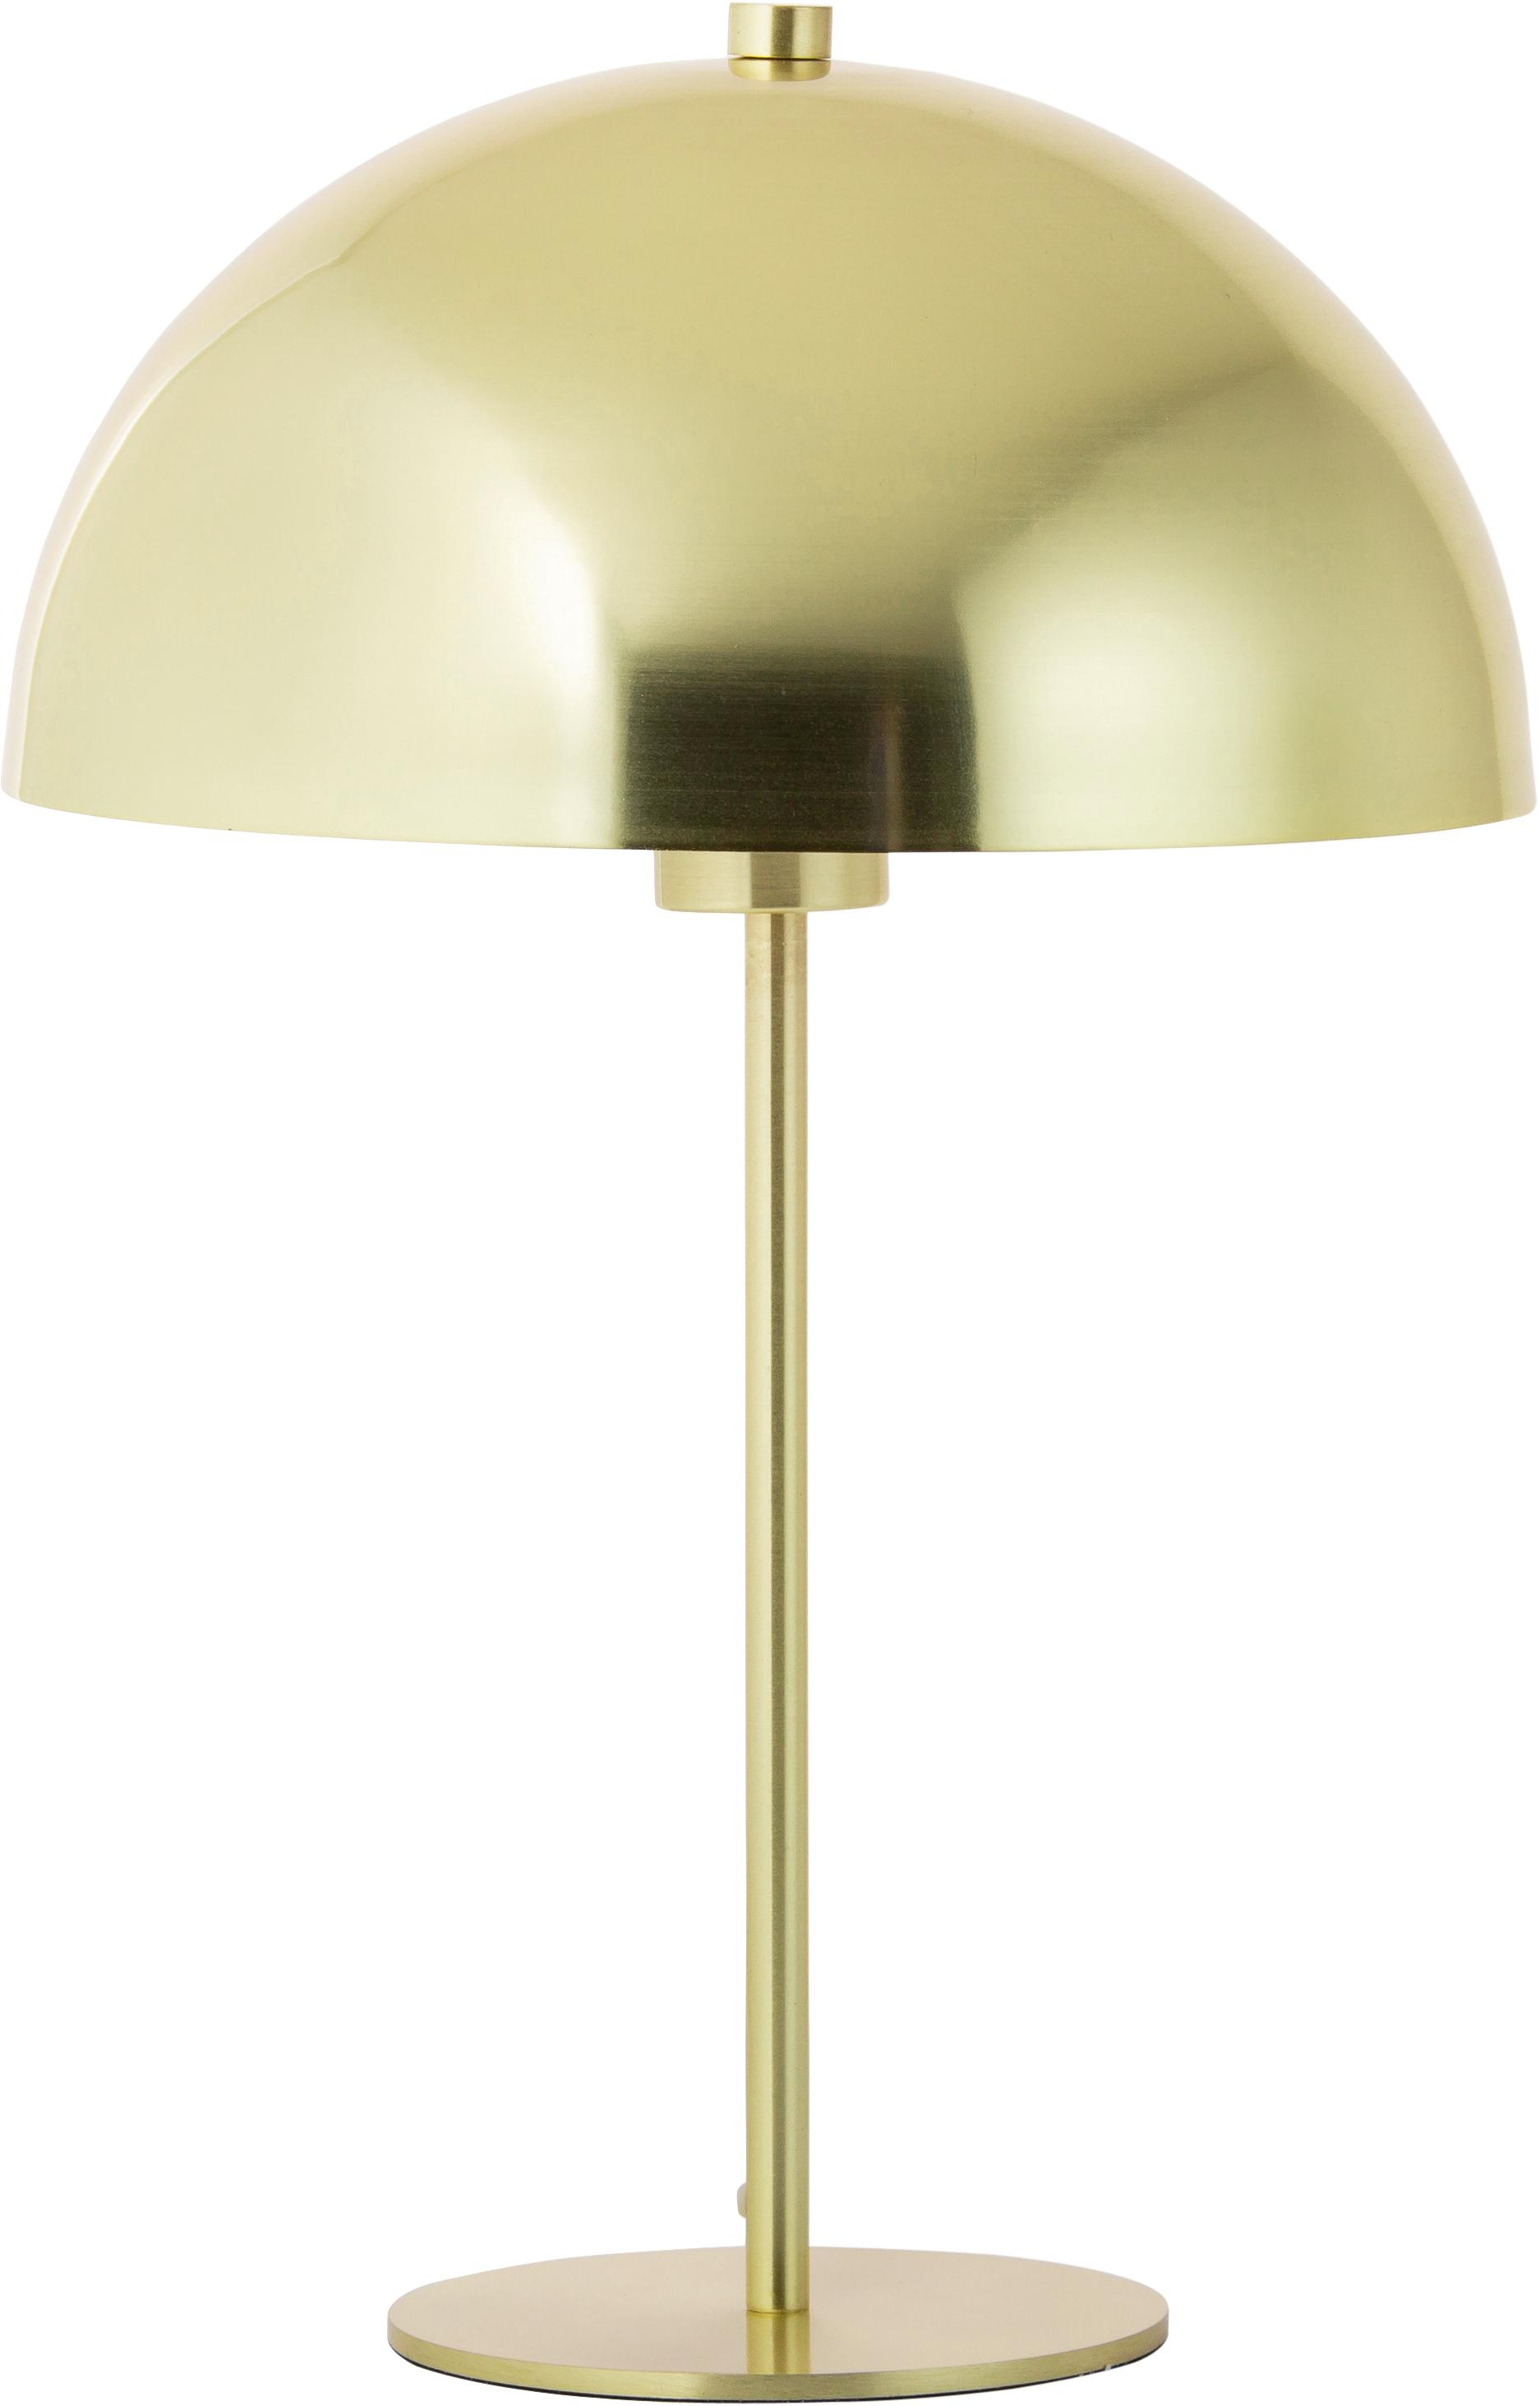 Lampada da tavolo in metallo Matilda, Paralume: metallo, ottonato, Base della lampada: metallo, ottonato, Ottone, Ø 29 x Alt. 45 cm